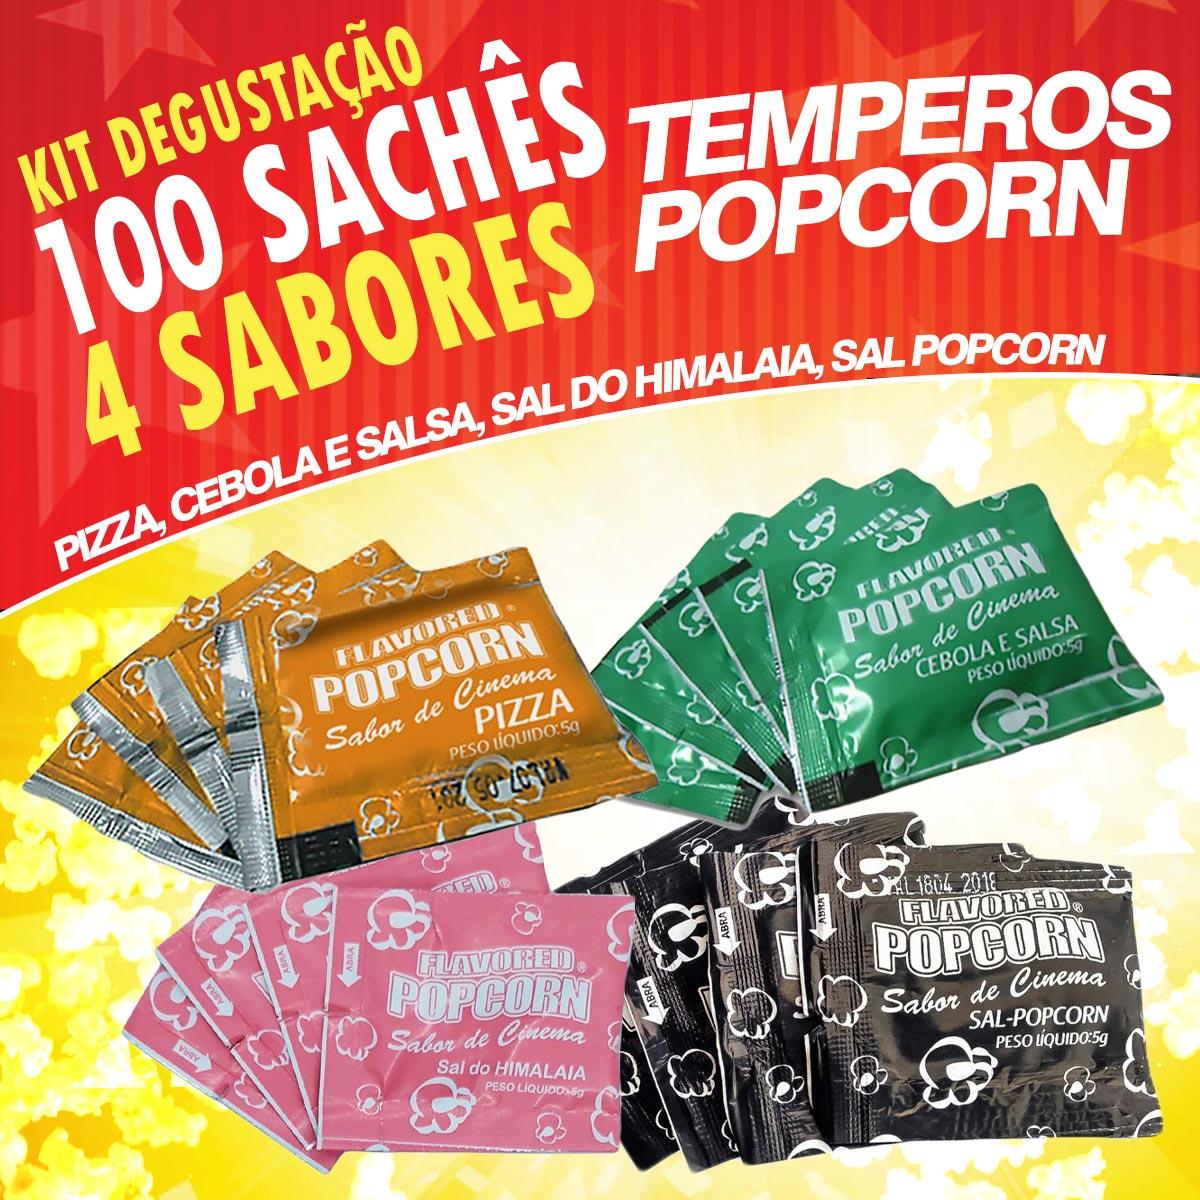 Temperos Popcorn 100 sachês. 25 Pizza, 25 Cebola e Salsa, 25 Sal do Himalaia e 25 Sal Popcorn